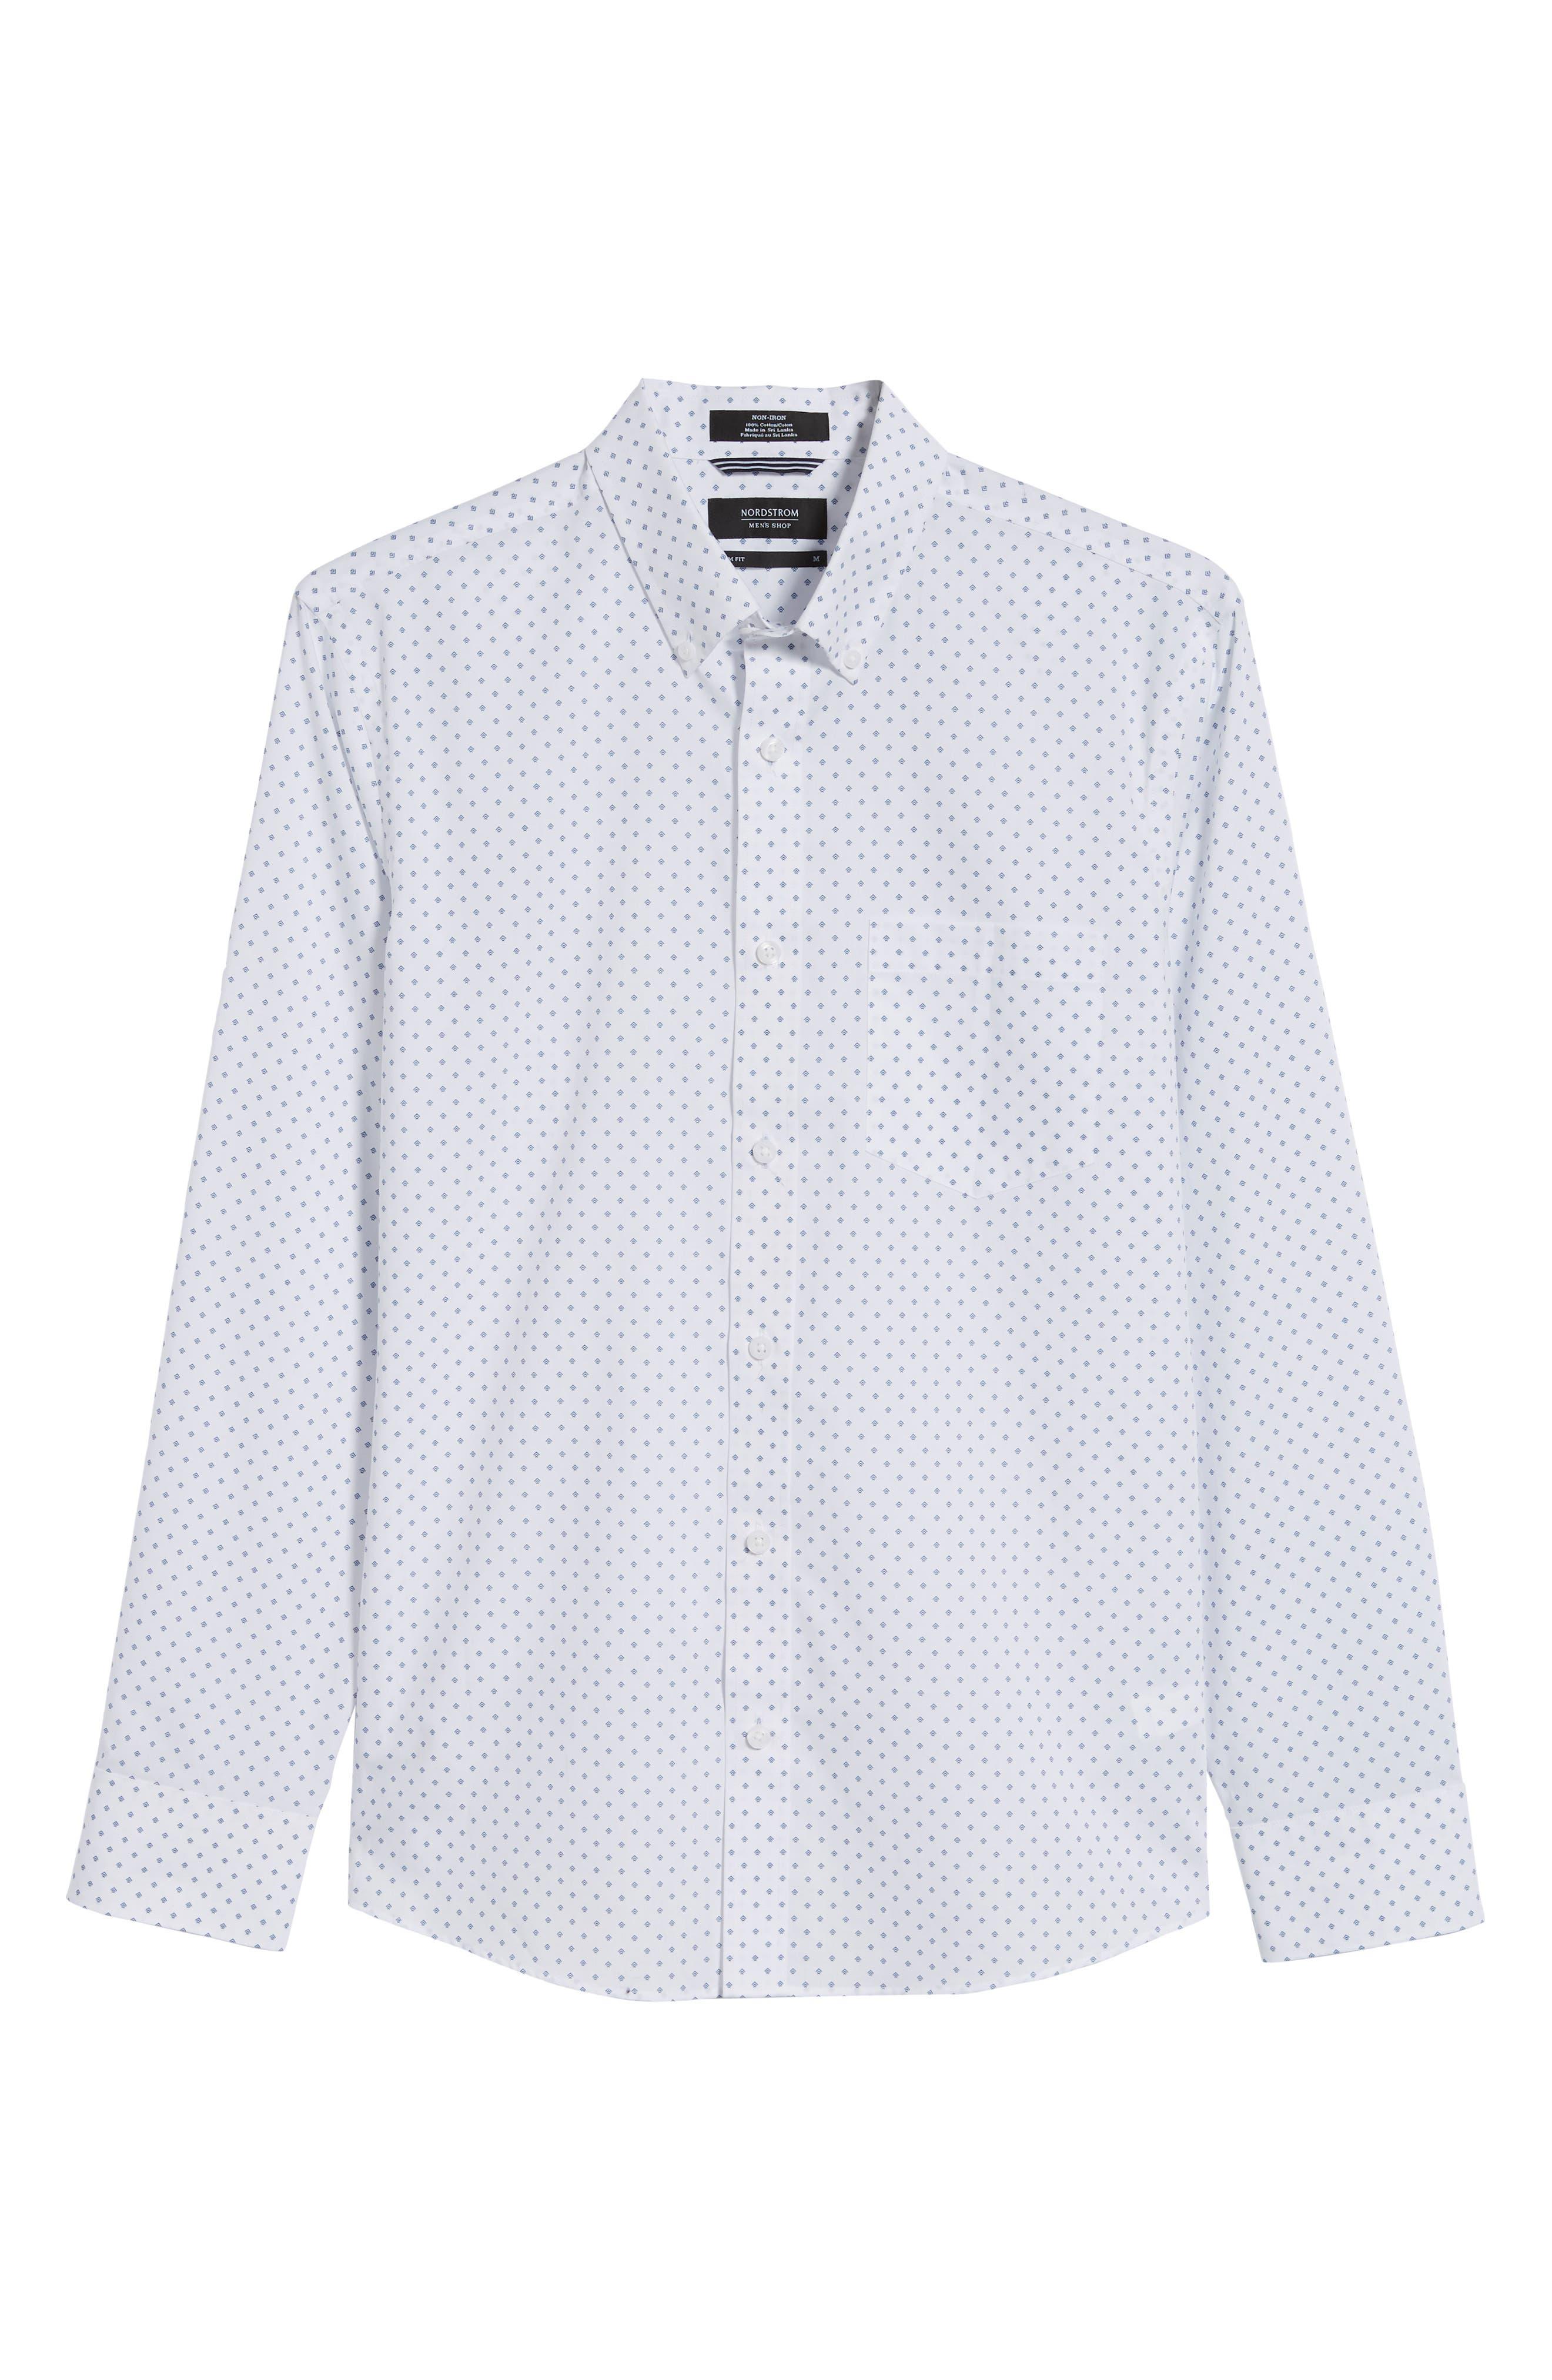 NORDSTROM MEN'S SHOP,                             Slim Fit Non-Iron Geo Print Sport Shirt,                             Alternate thumbnail 5, color,                             100